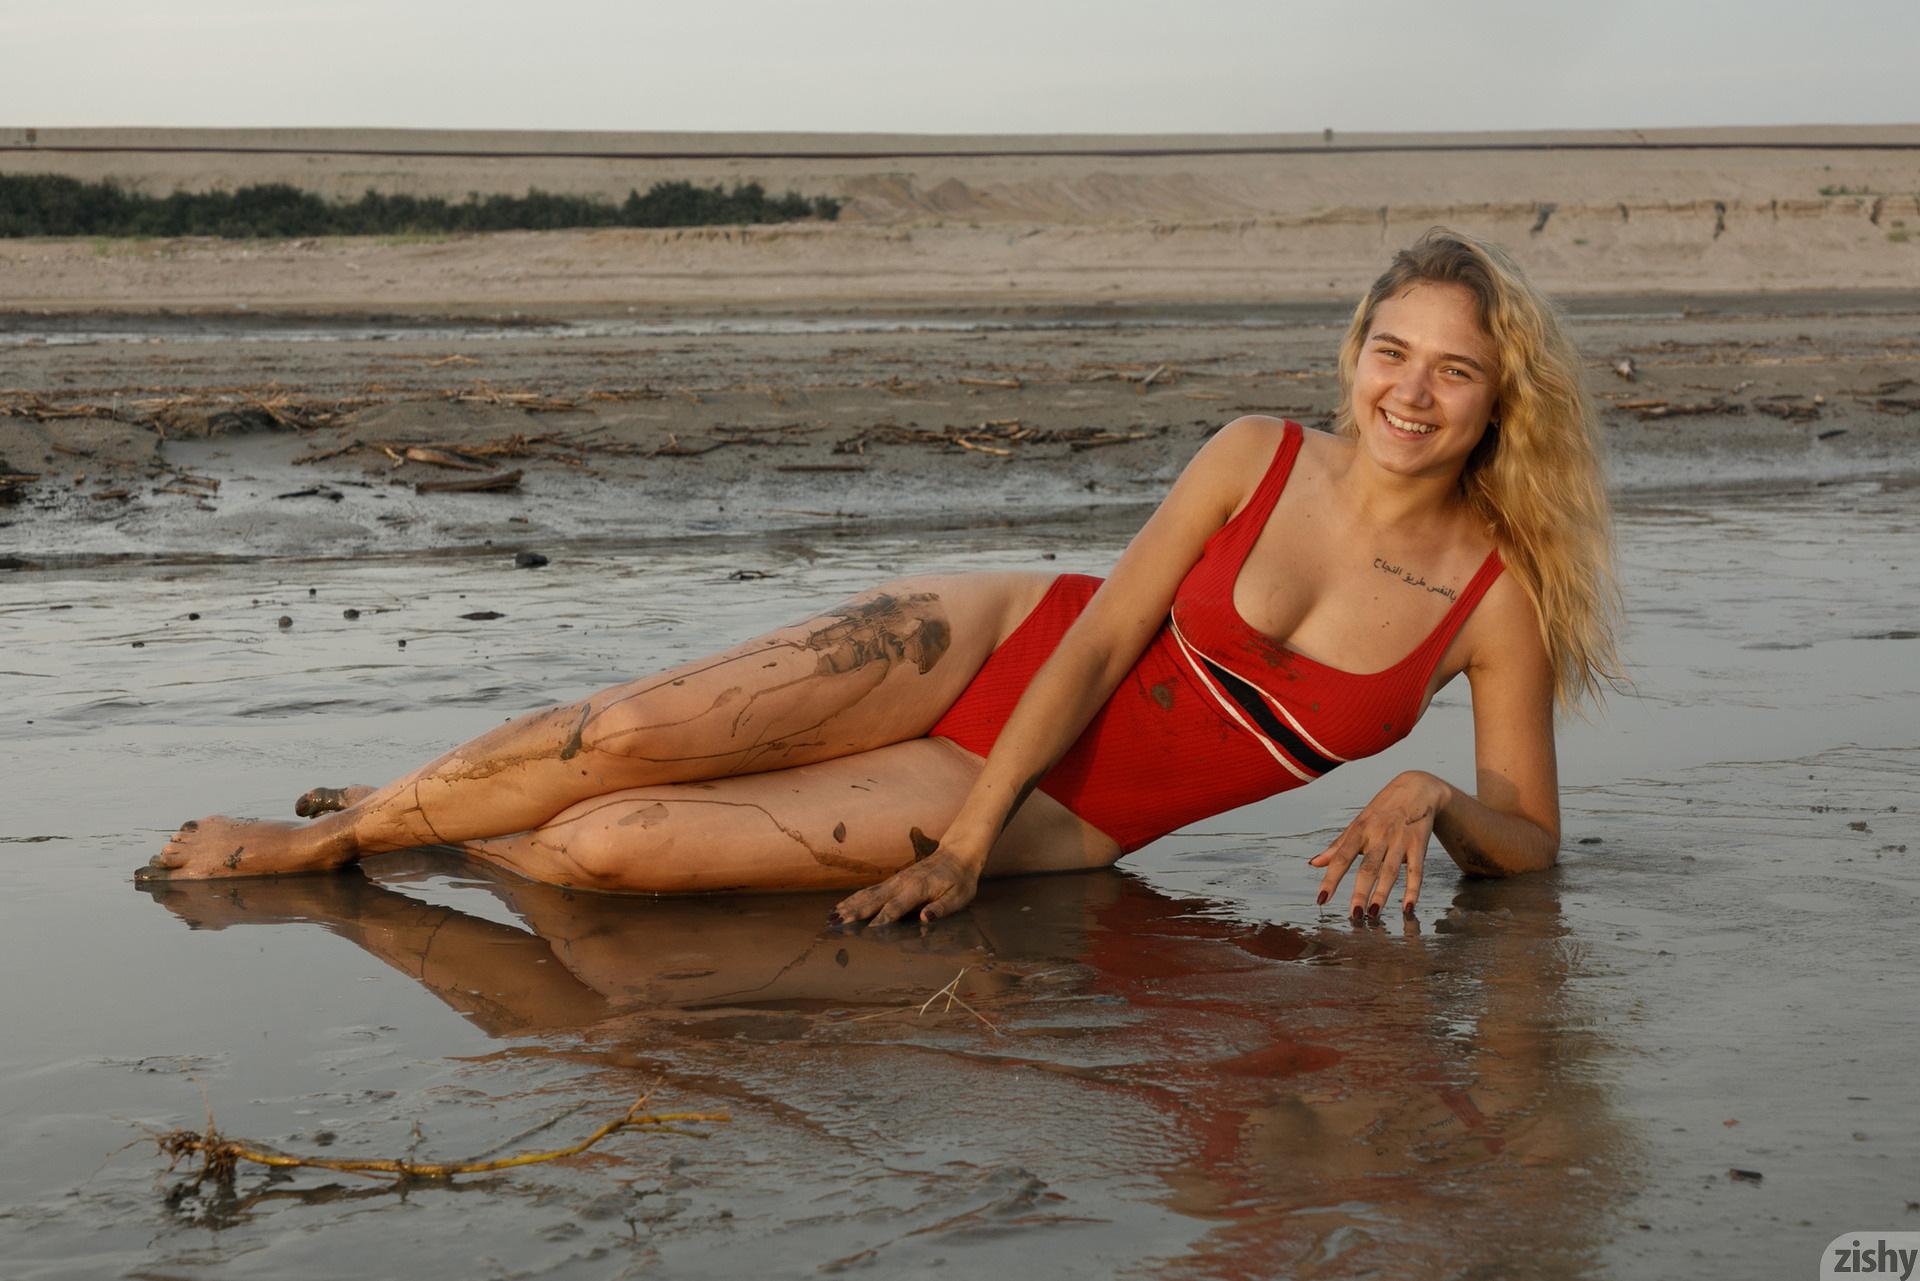 Sofia Orlova On Gryaznyy Beach Zishy (16)